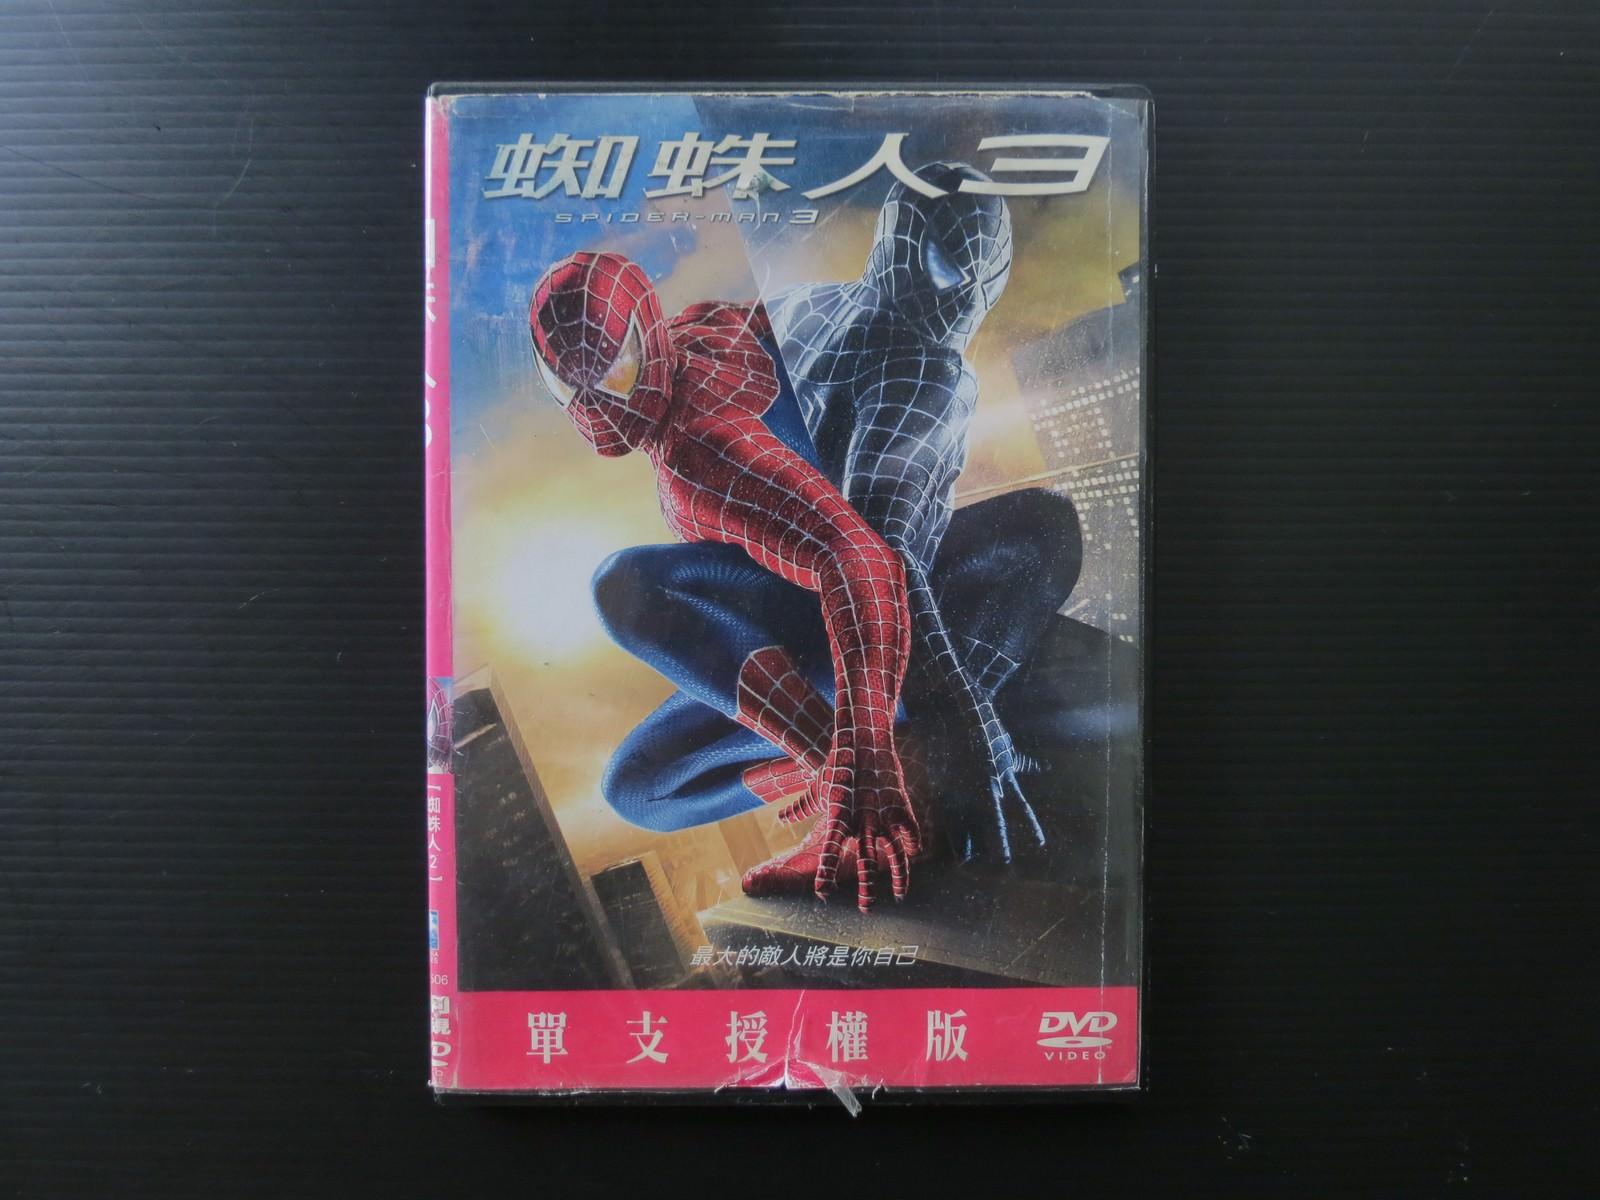 Movie, Spider-Man 3(美國, 2007年) / 蜘蛛人3(台灣) / 蜘蛛侠3(中國) / 蜘蛛俠3(香港), 電影DVD